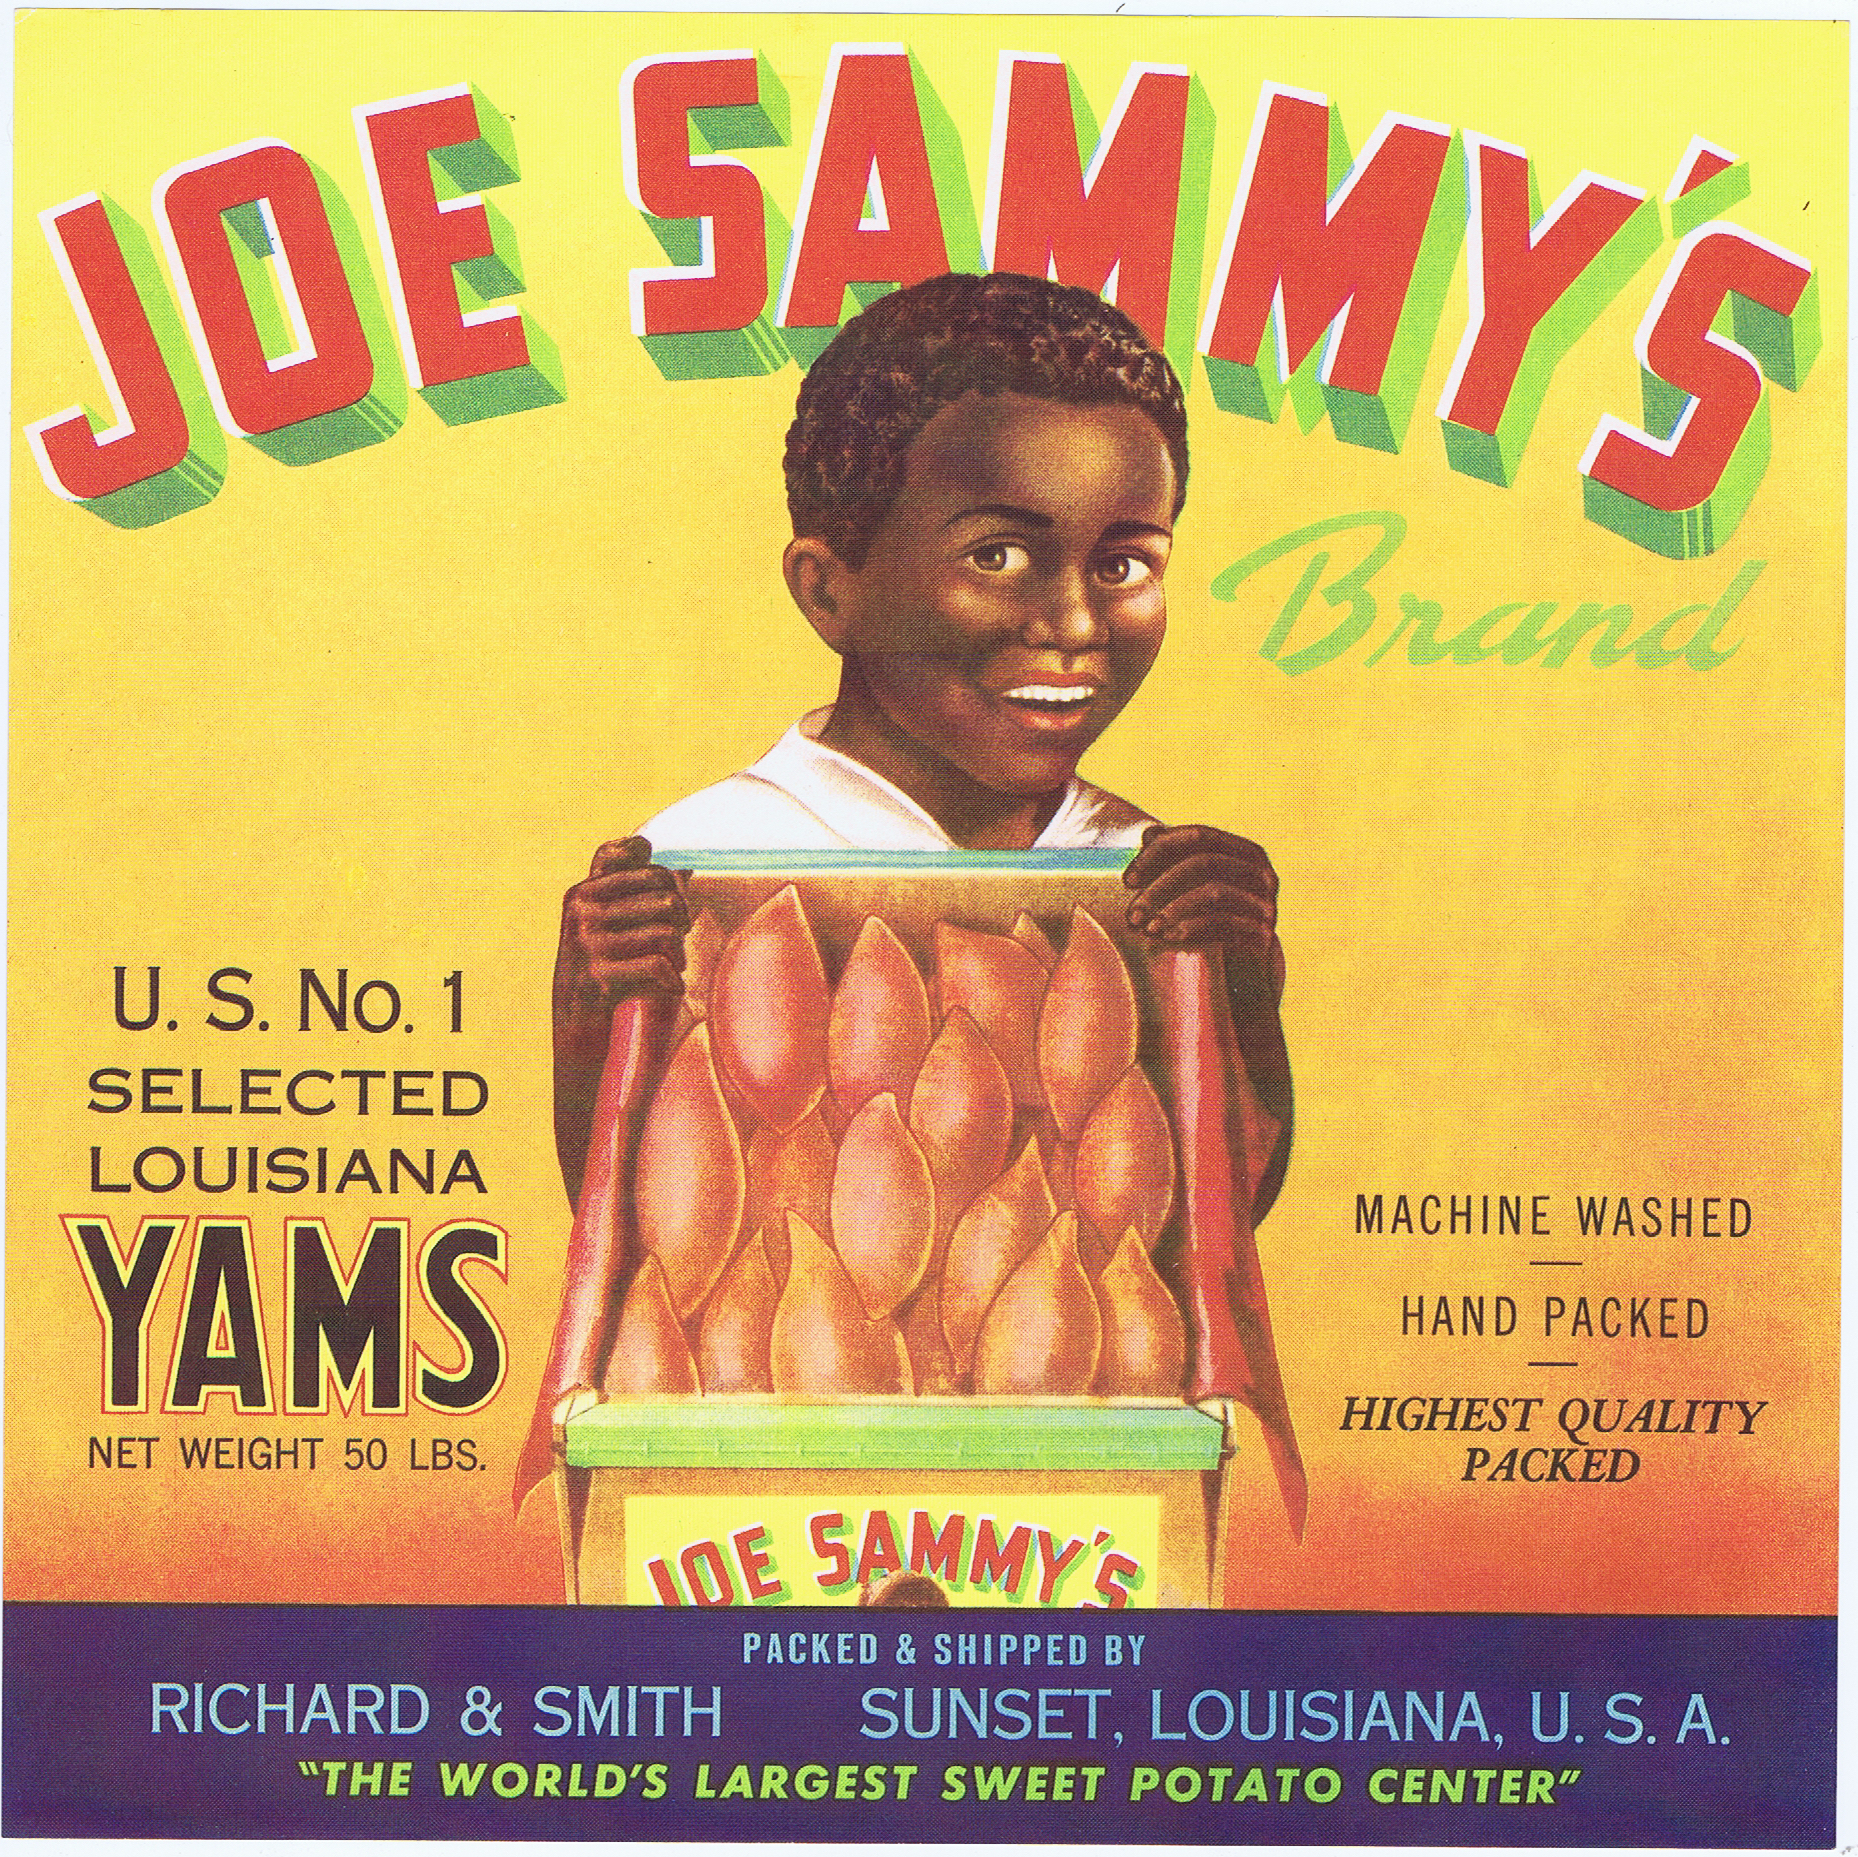 L1341JOE SAMMY'S BRAND YAMS LABEL